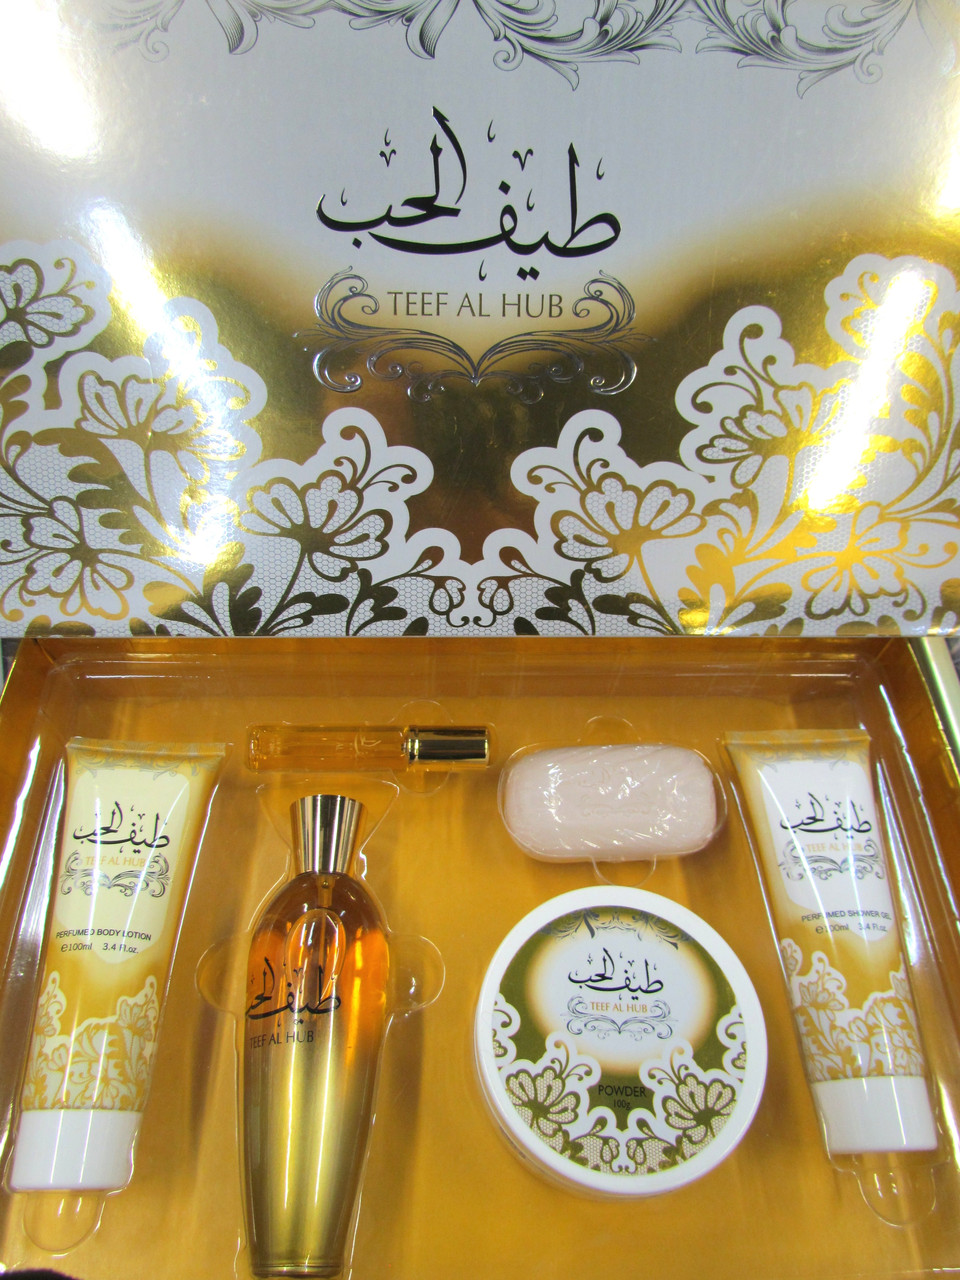 Парфюмерно - косметический сет  для женщинTeef Al Hub от Ard Al Zaafaran 100 мл +